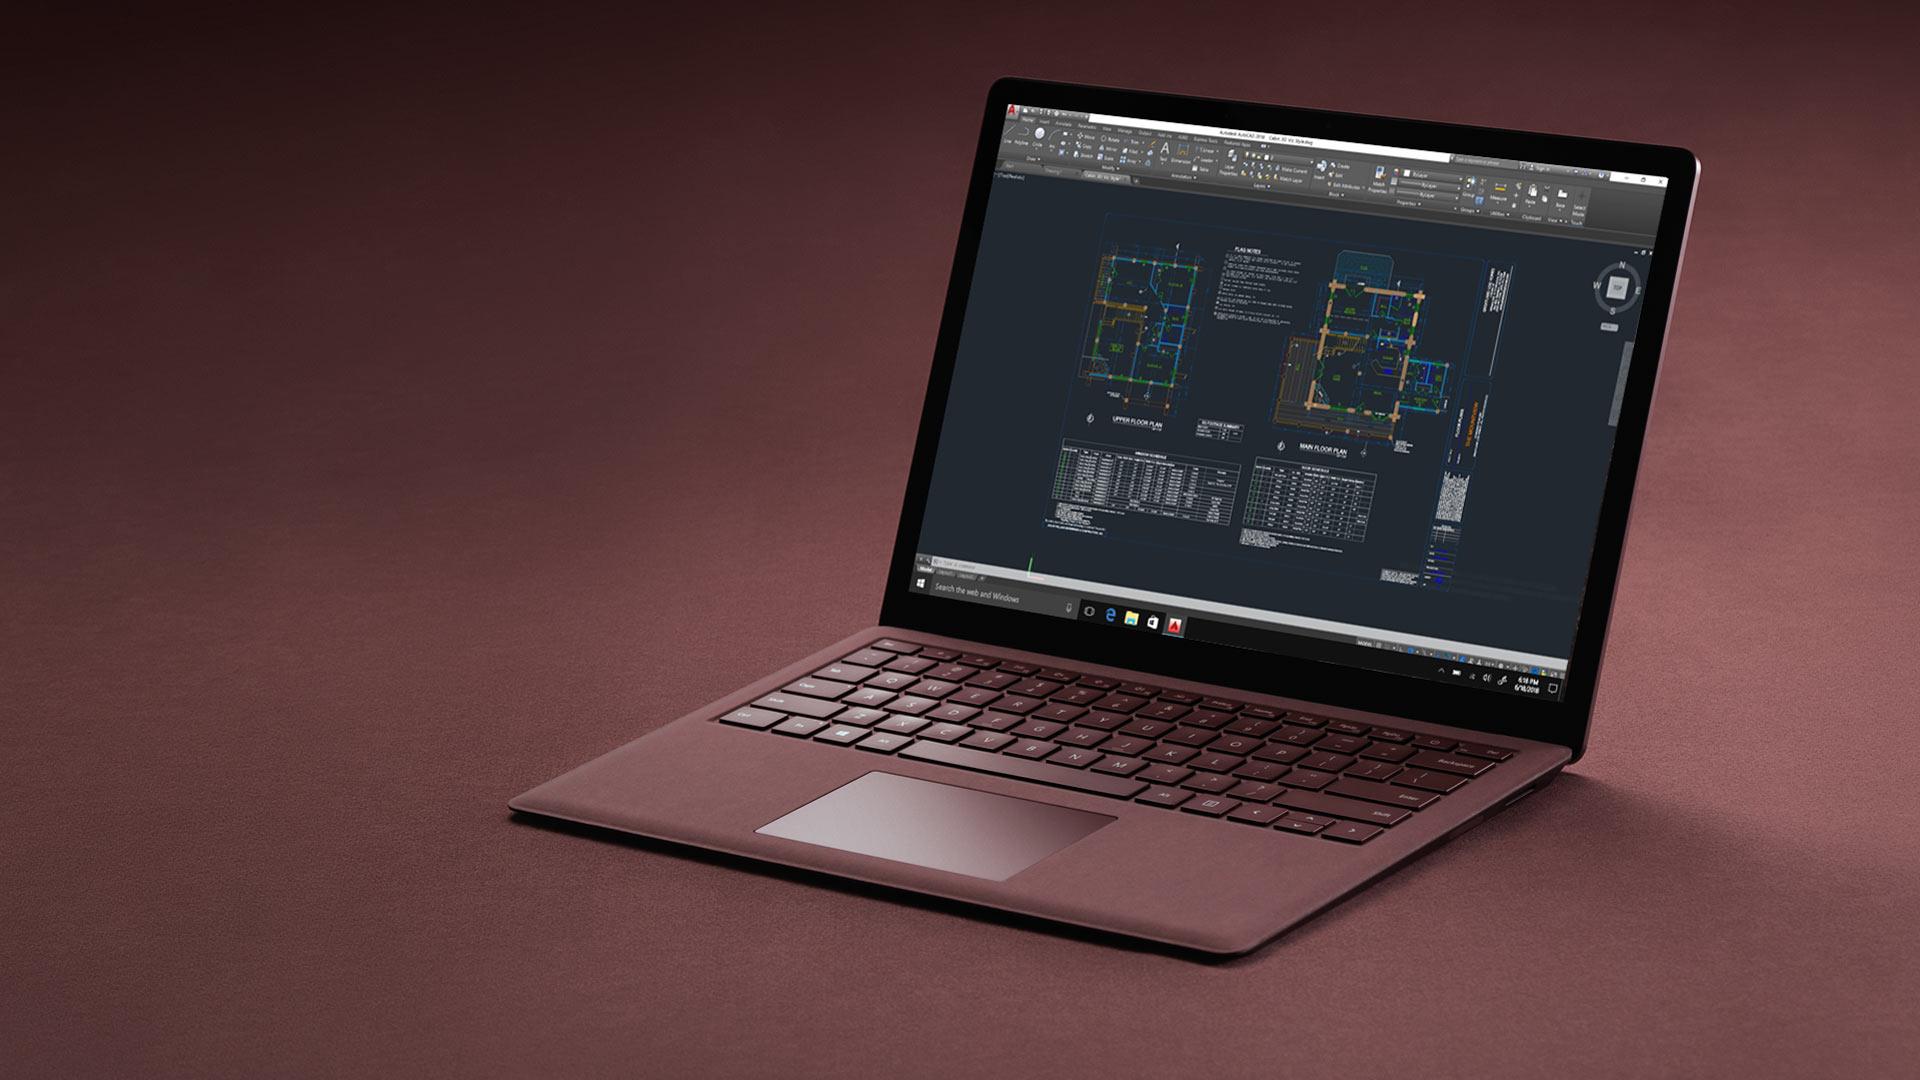 Vinröd Surface Laptop med AutoCAD-skärm.